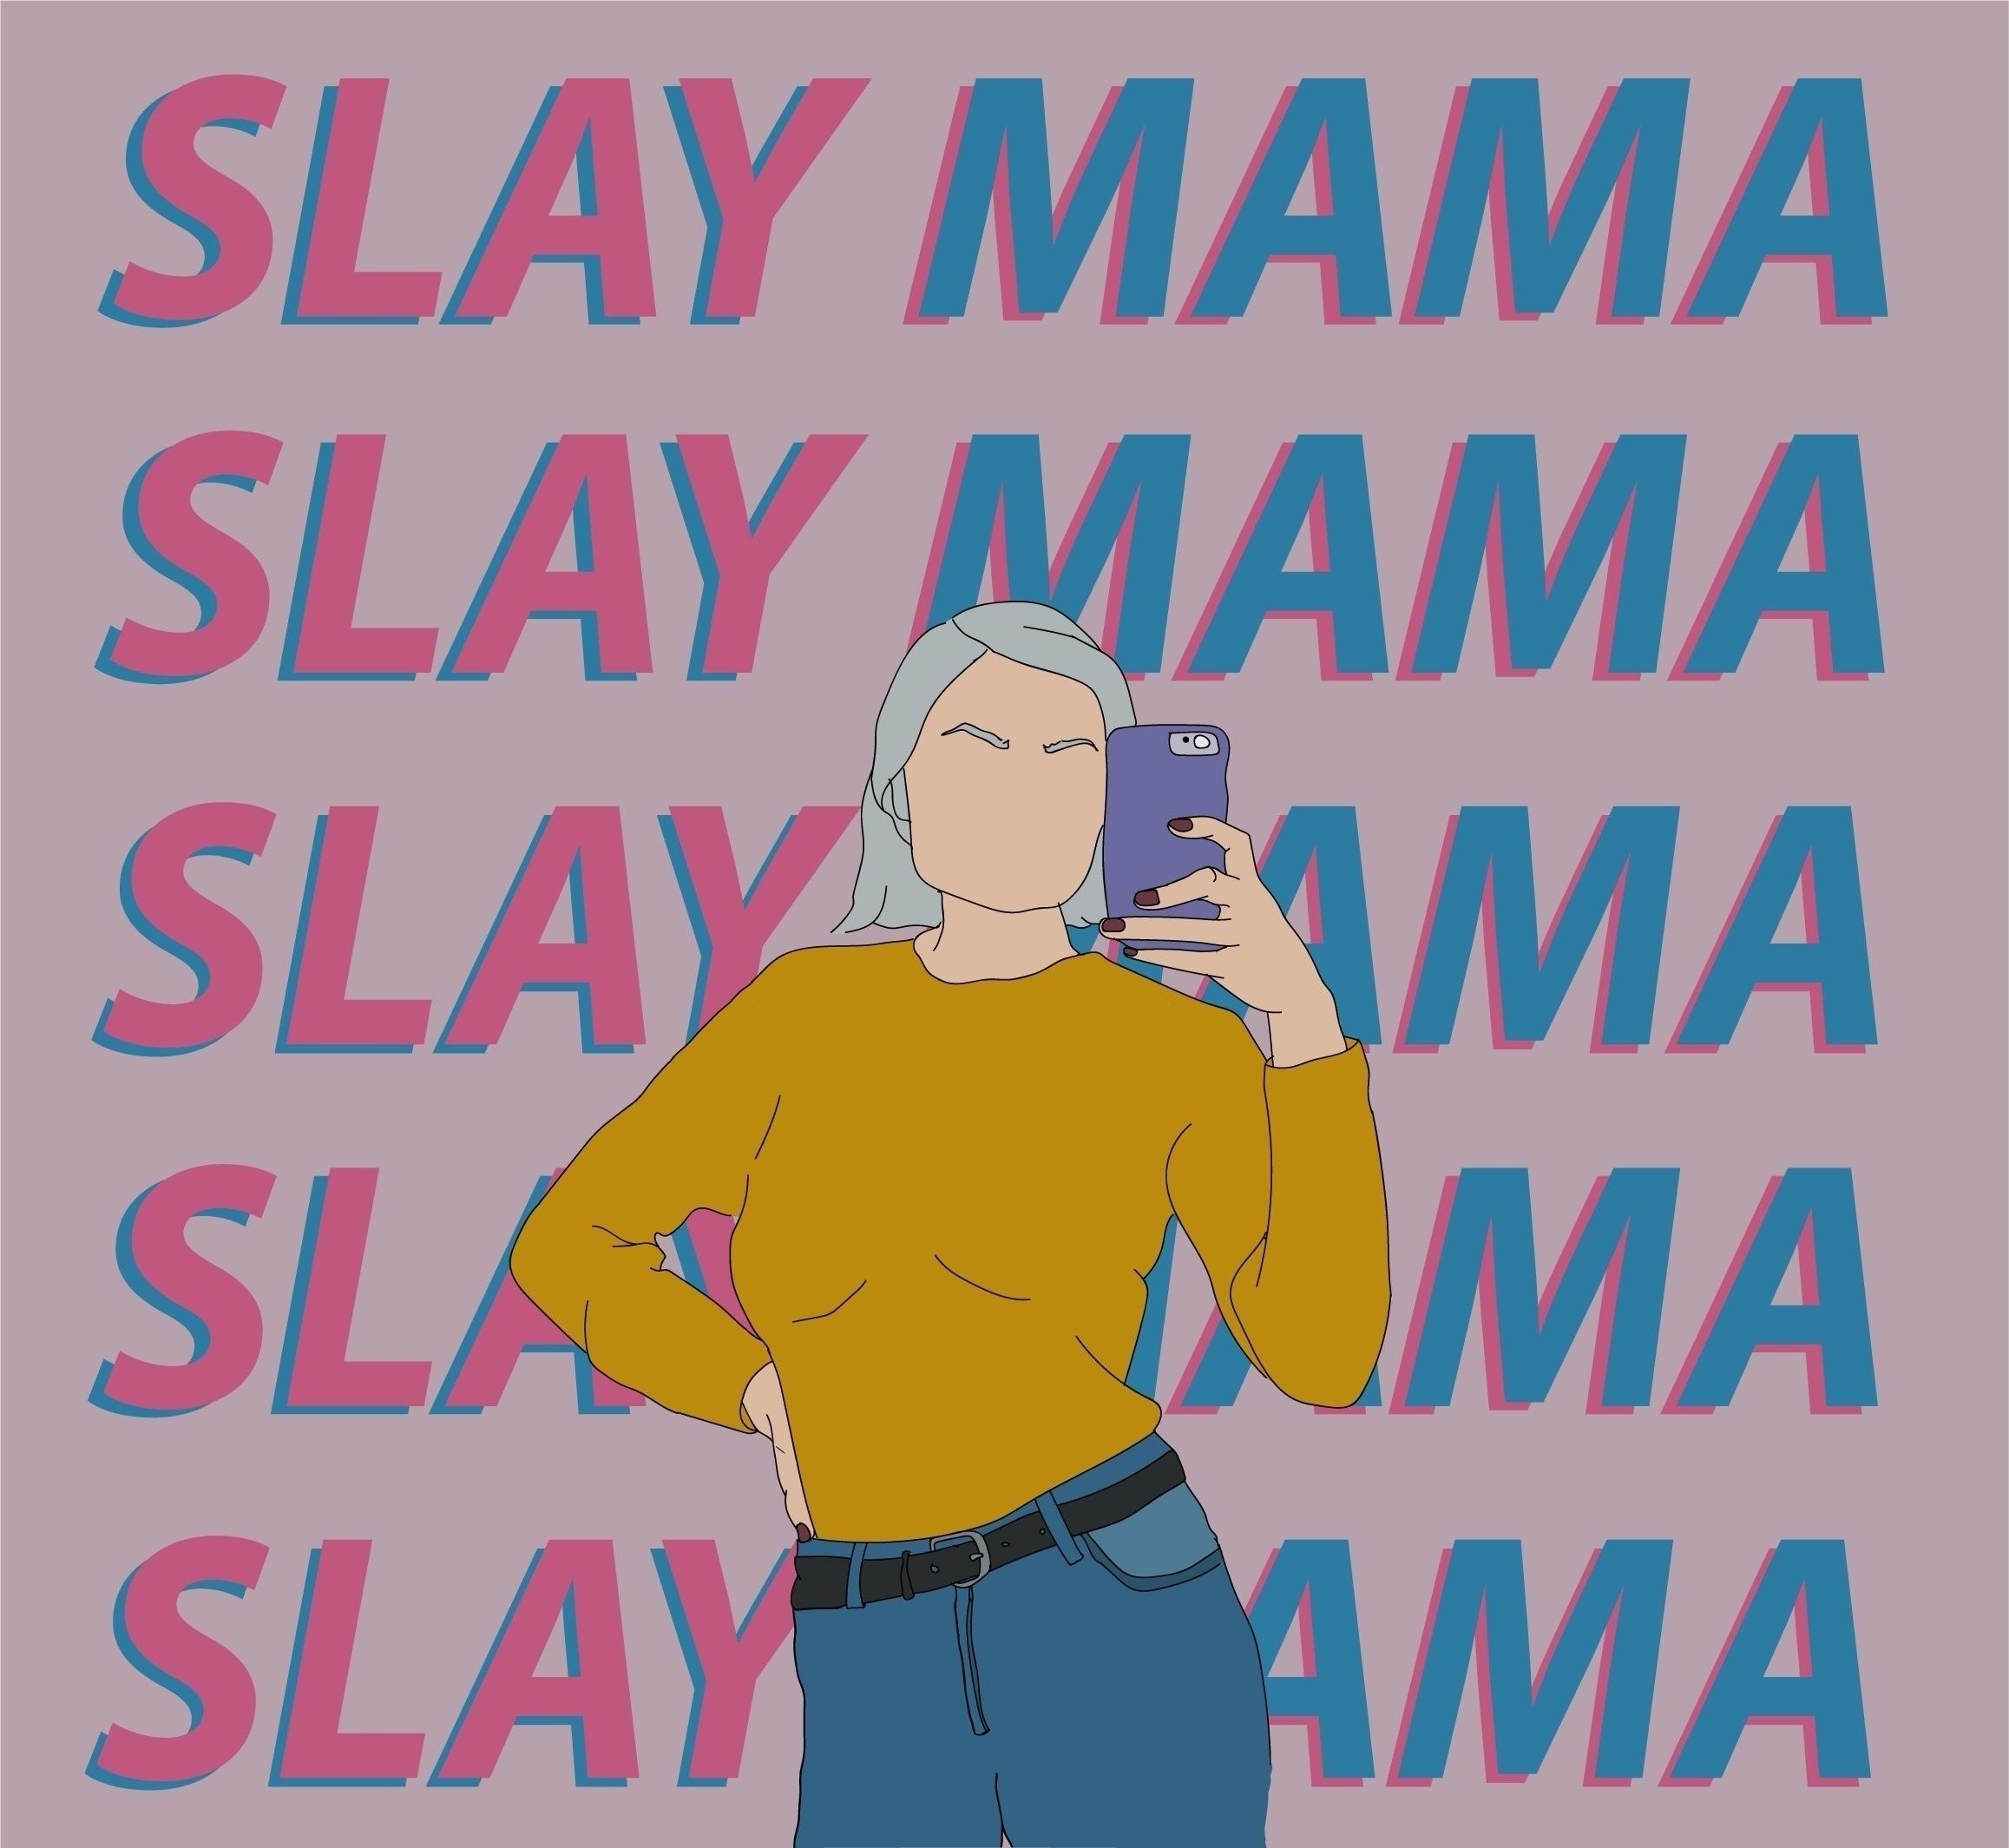 Slay MAMA - Art, Design, Illustration - nandyblu | ello